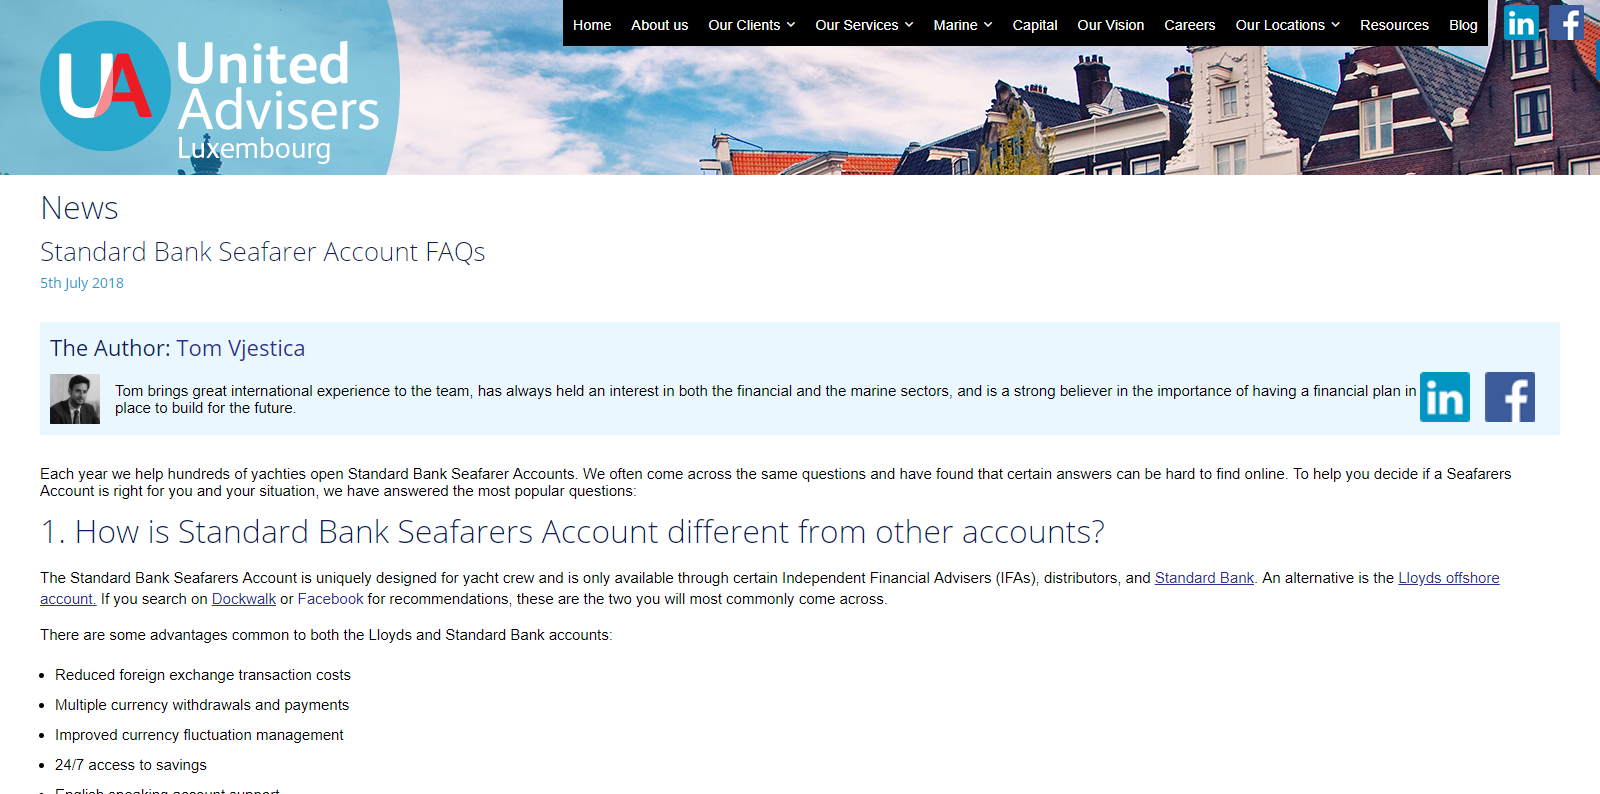 Standard Bank Seafarer Account FAQs